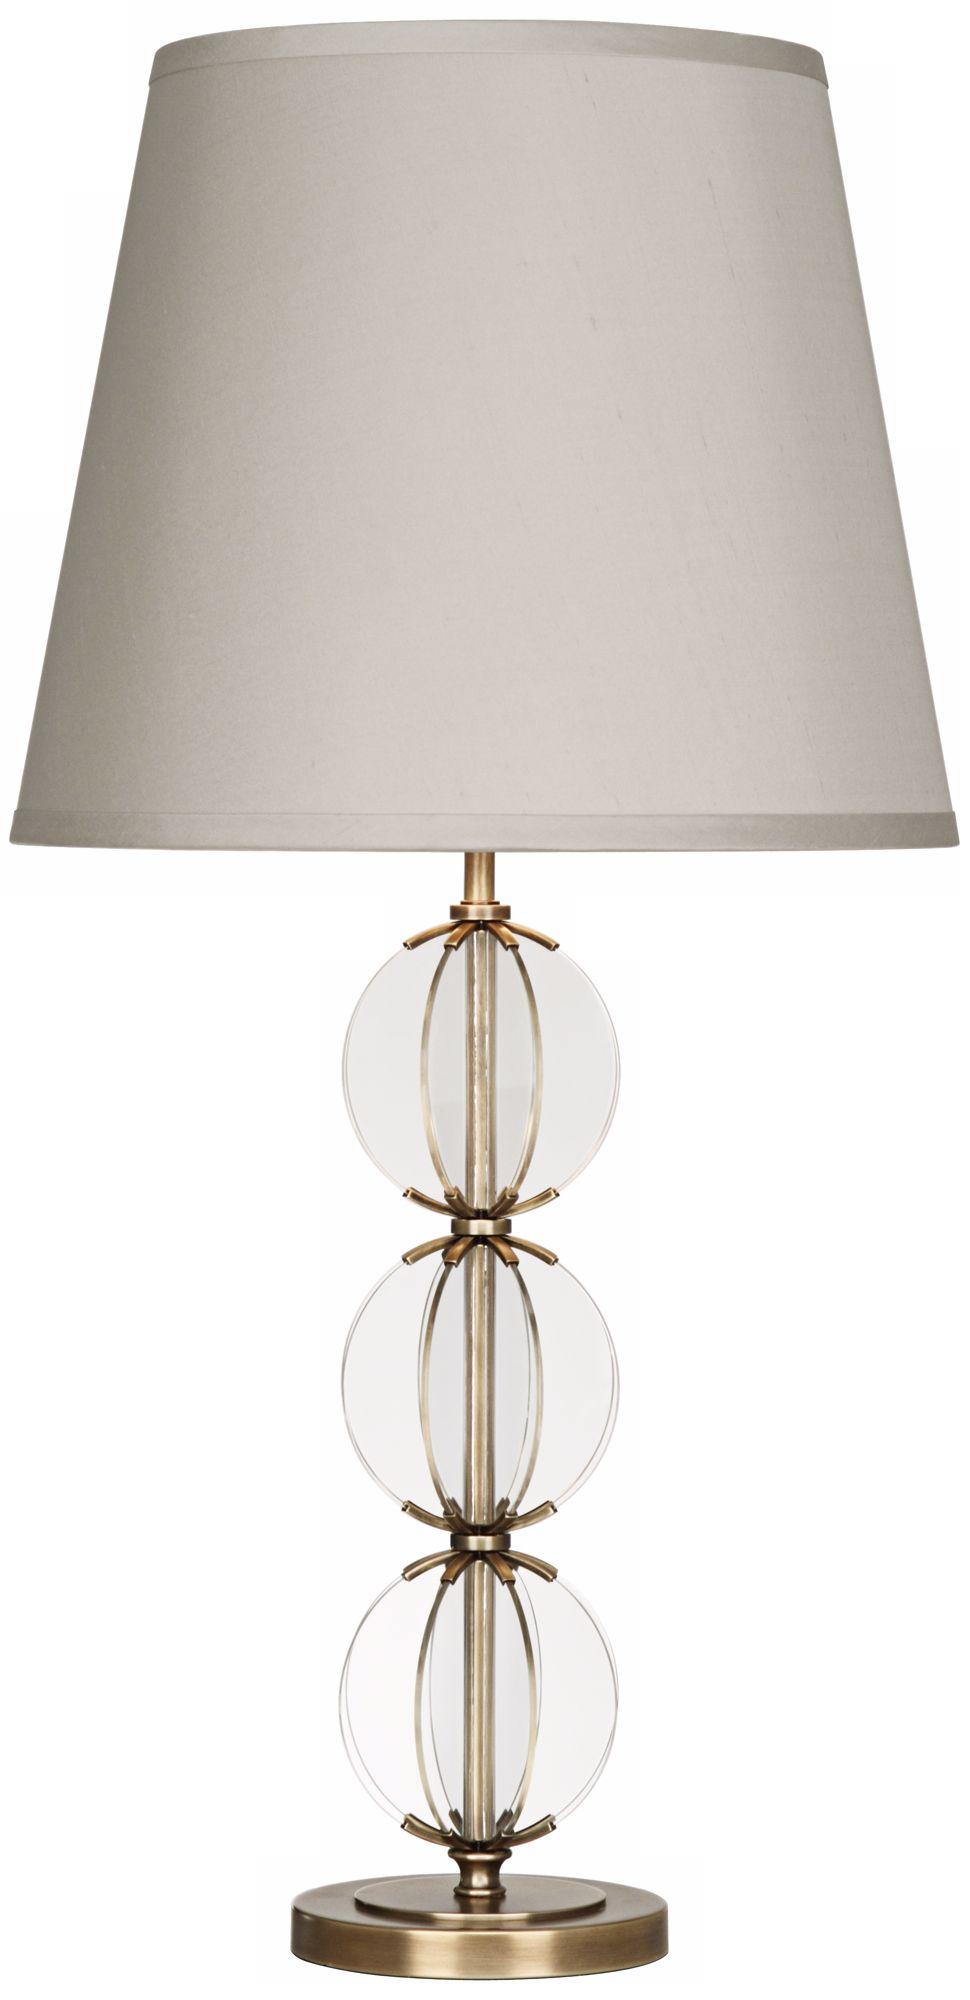 robert abbey latitude clear glass antique brass table lamp - Robert Abbey